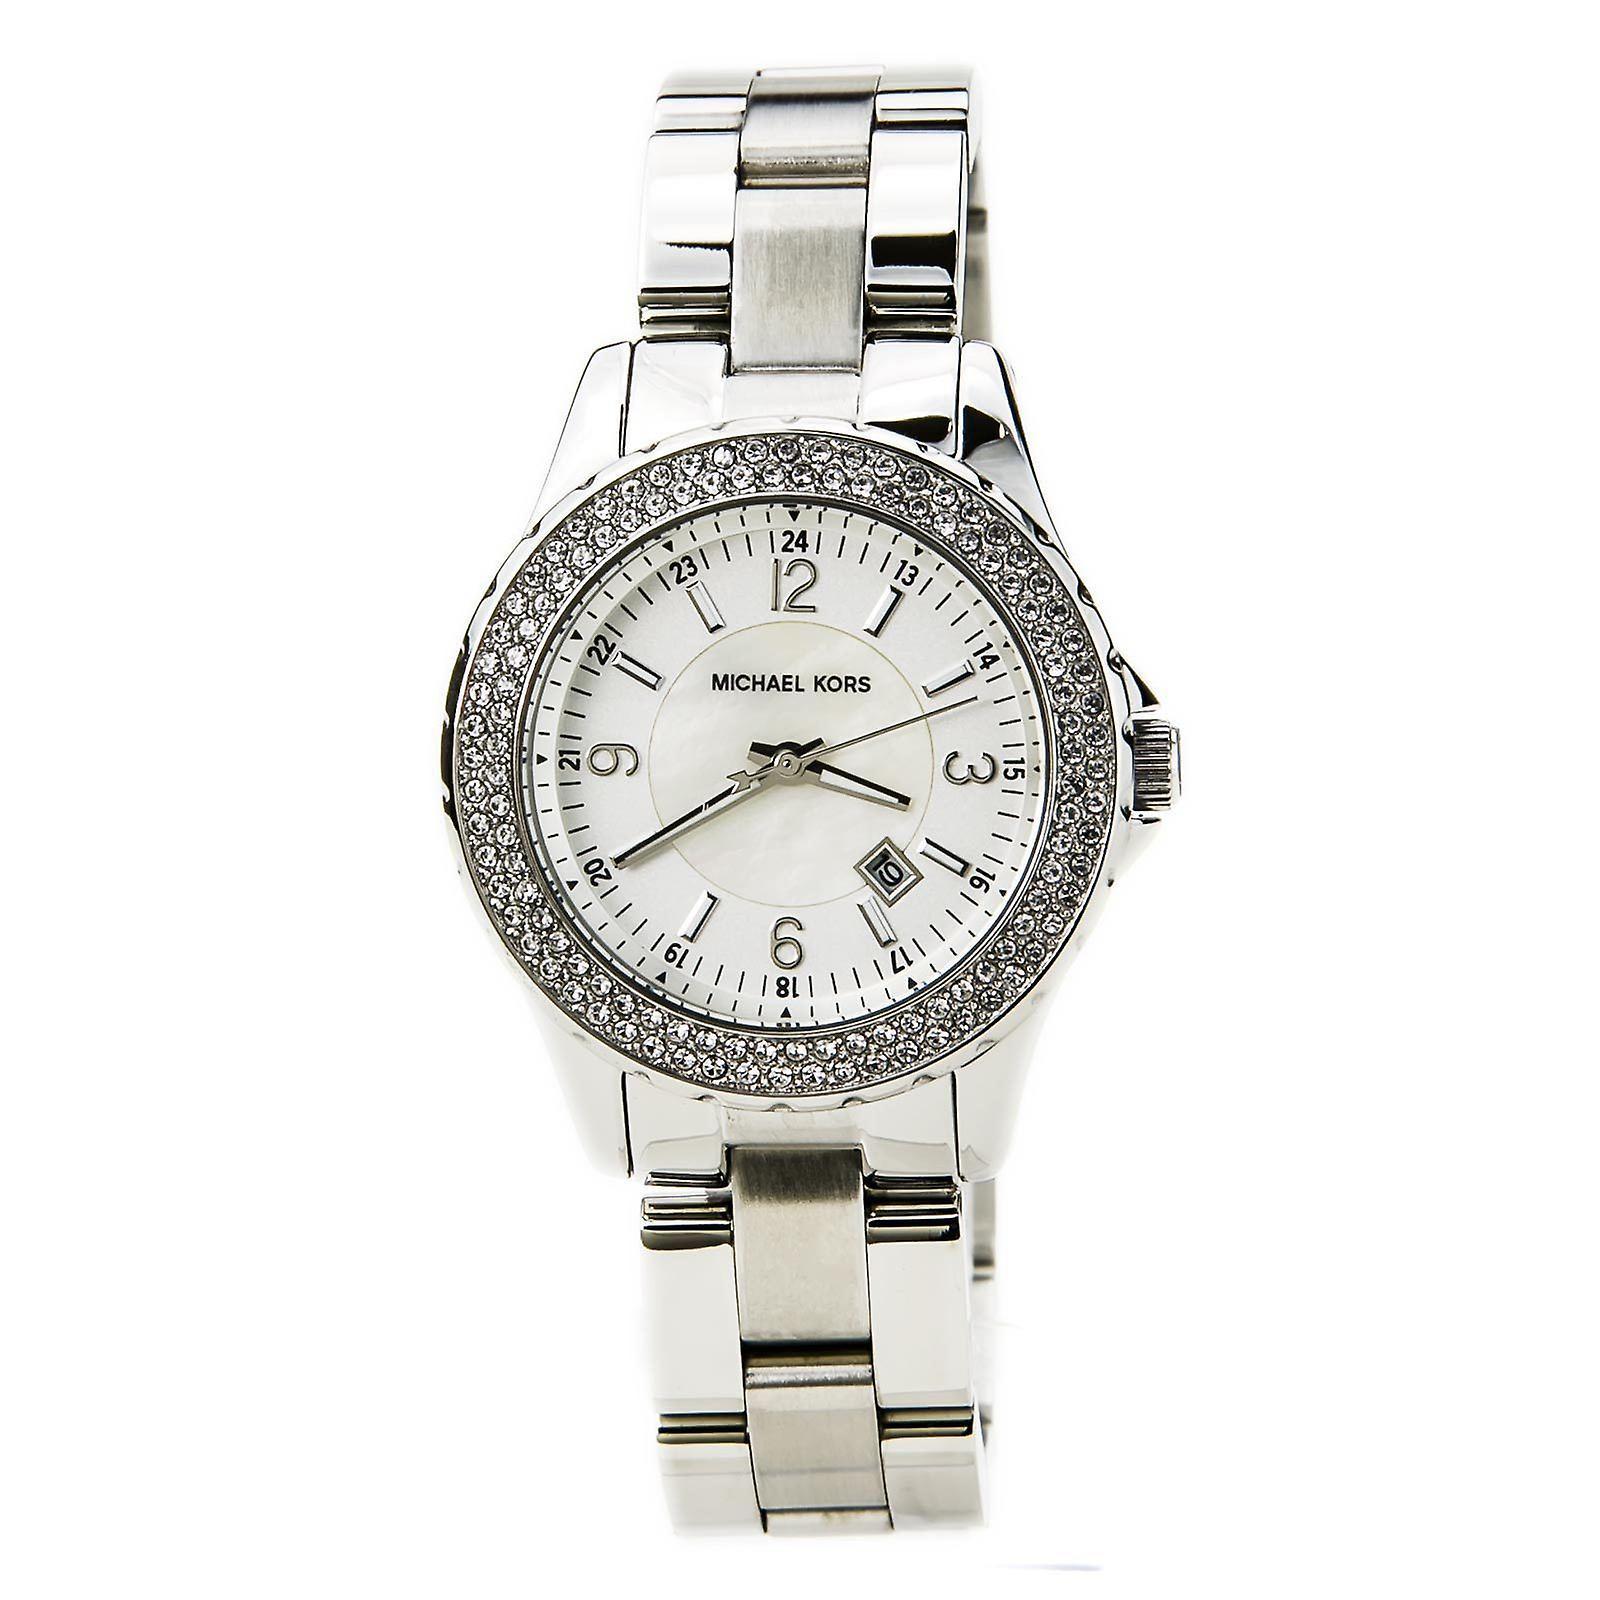 Michael Kors Womens Madison Wrist Watch visage blanc cadran argenté MK5401